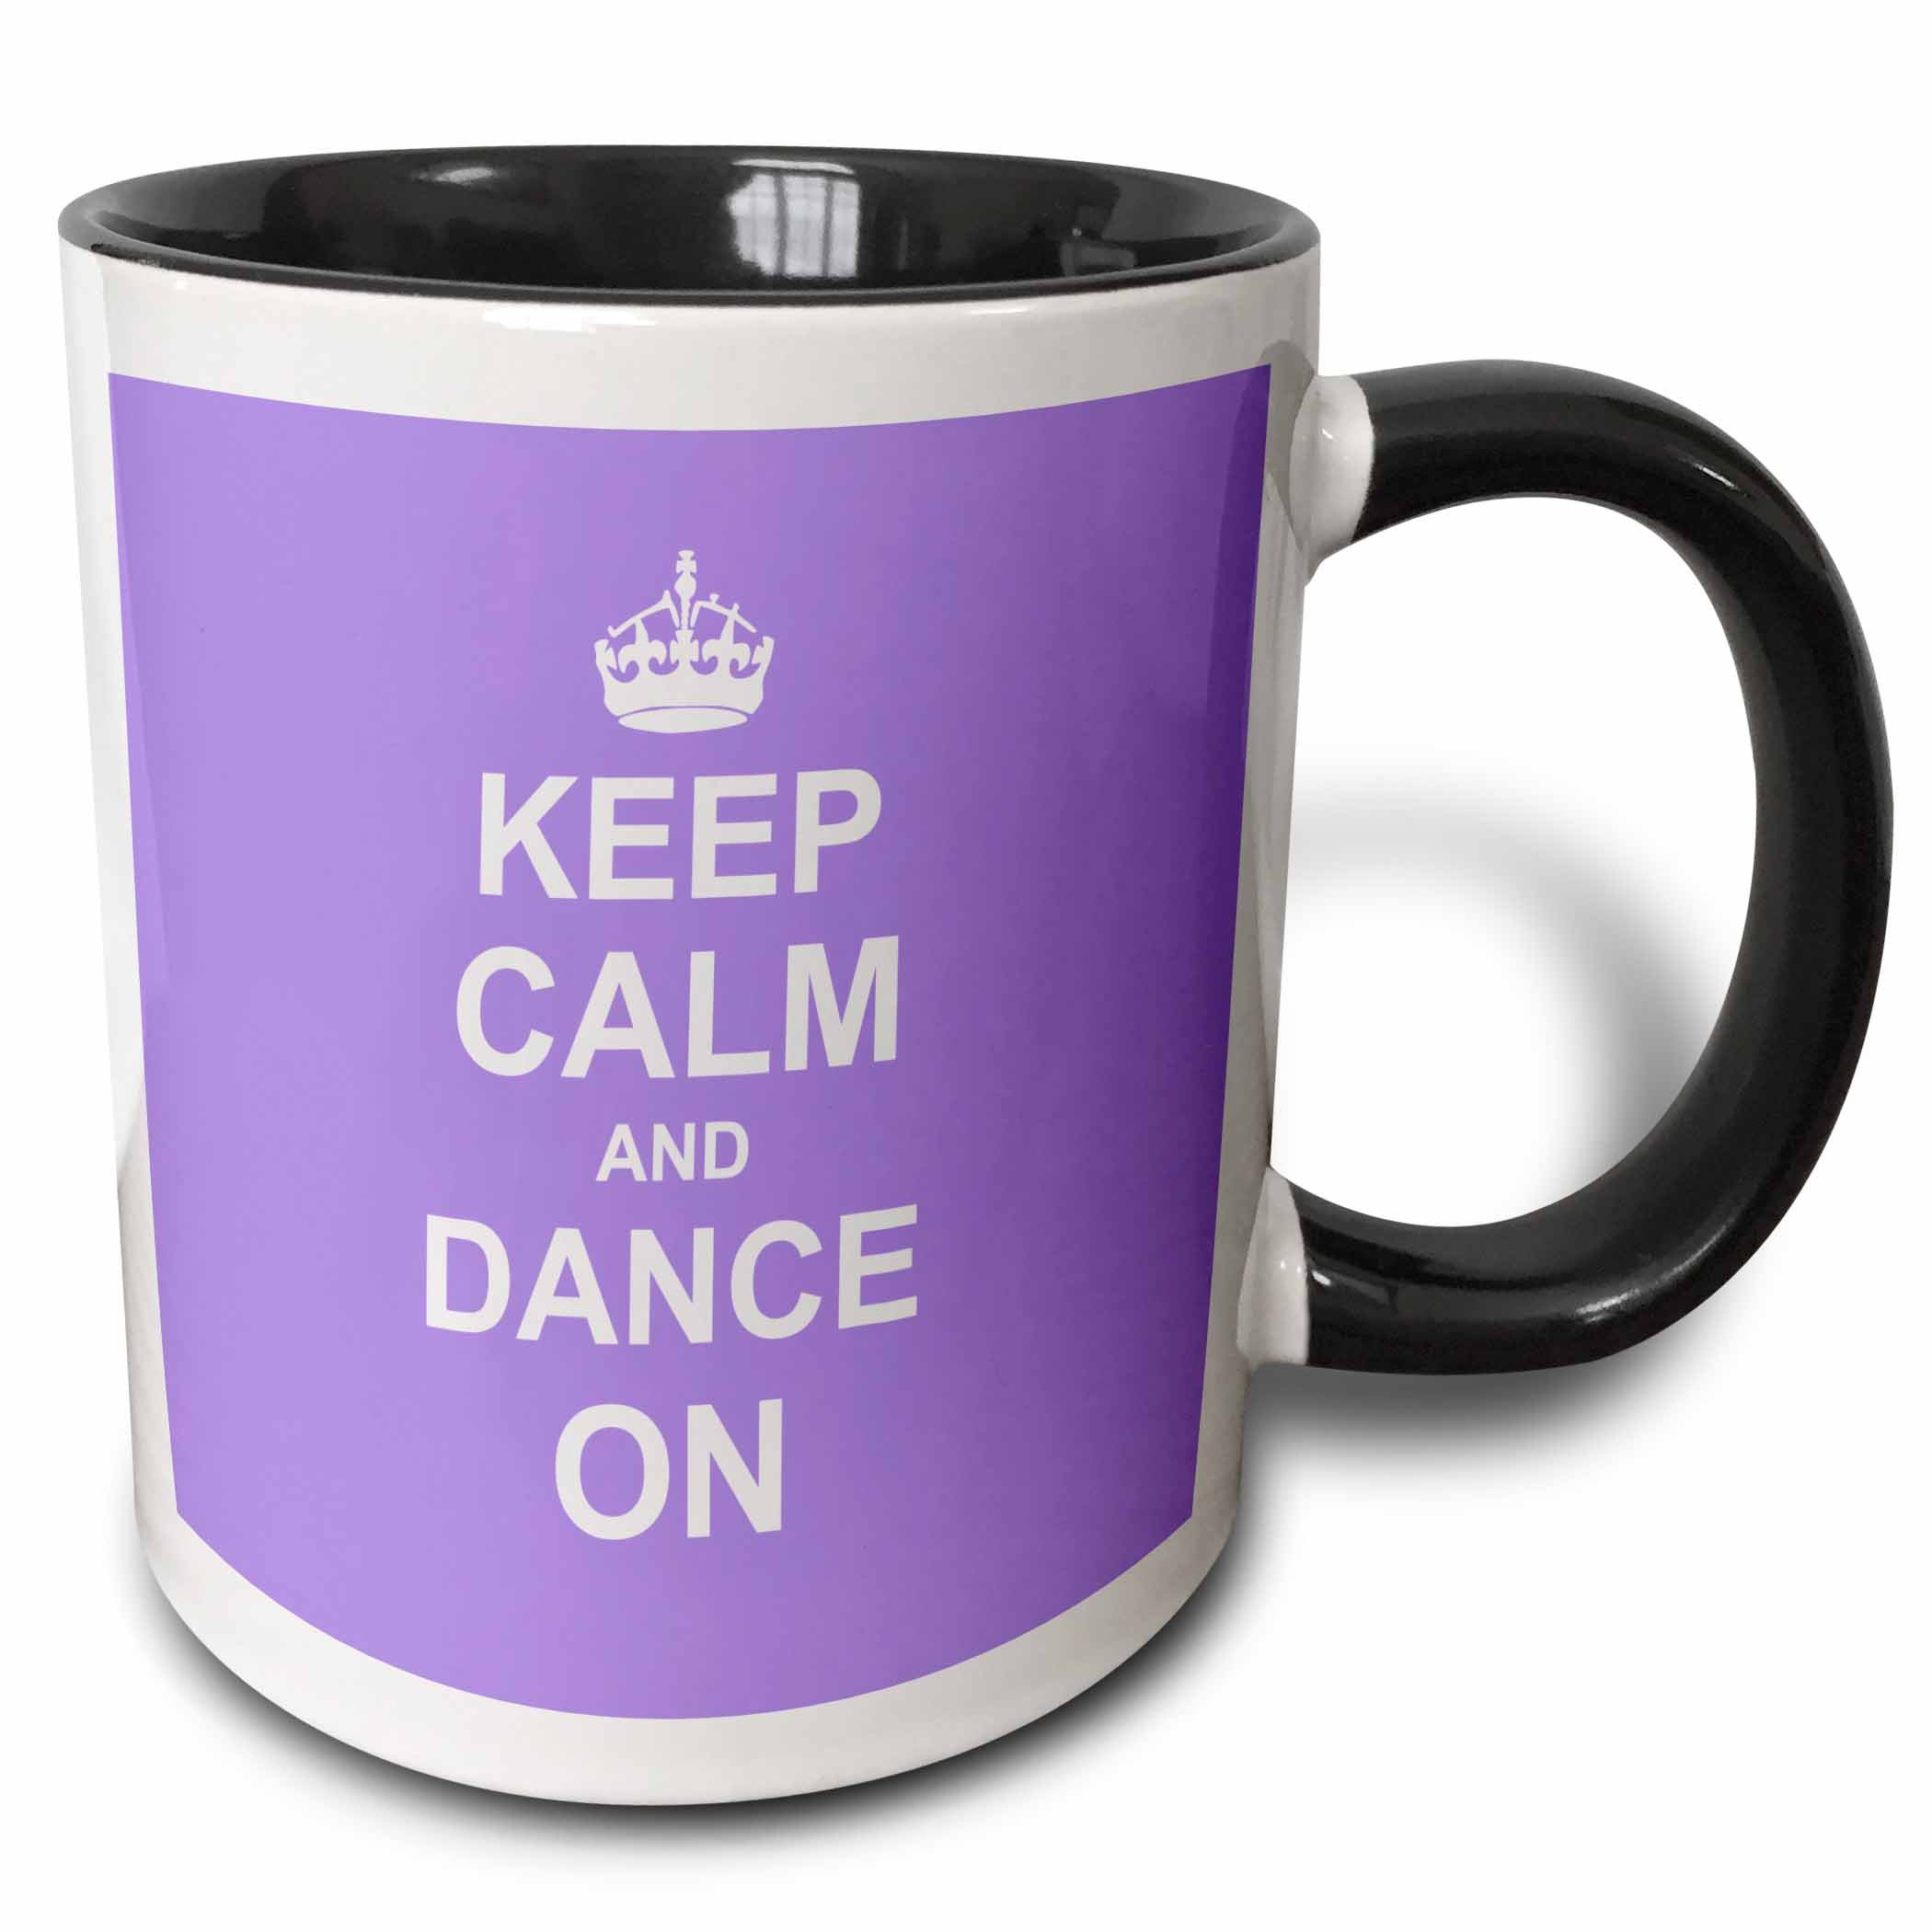 3dRose (mug_157706_4) Keep Calm and Dance on - carry on dancing - gifts for dancers lilac purple fun funny humor humorous - Two Tone Black Mug, 11oz